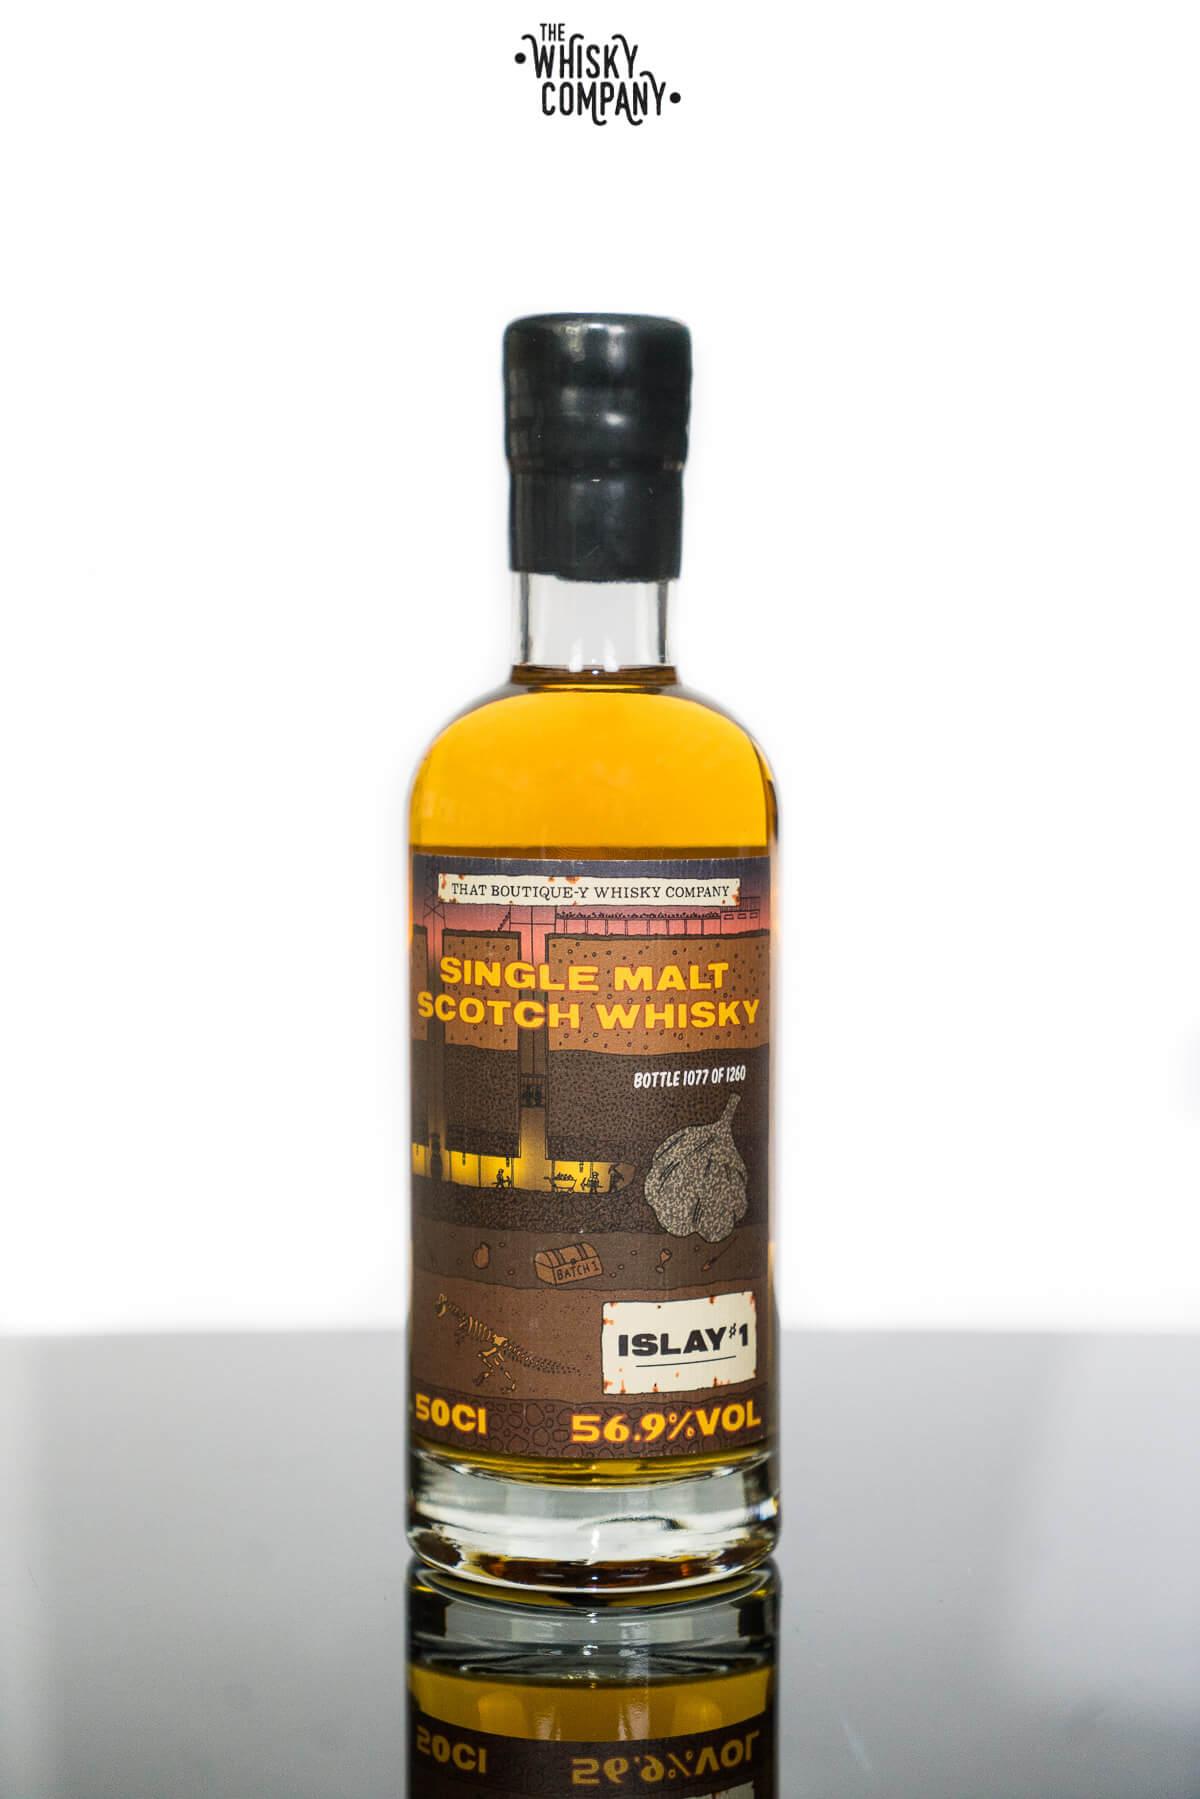 Islay Distillery #1 Single Malt Scotch Whisky - That Boutique-Y Whisky Company (500ml)